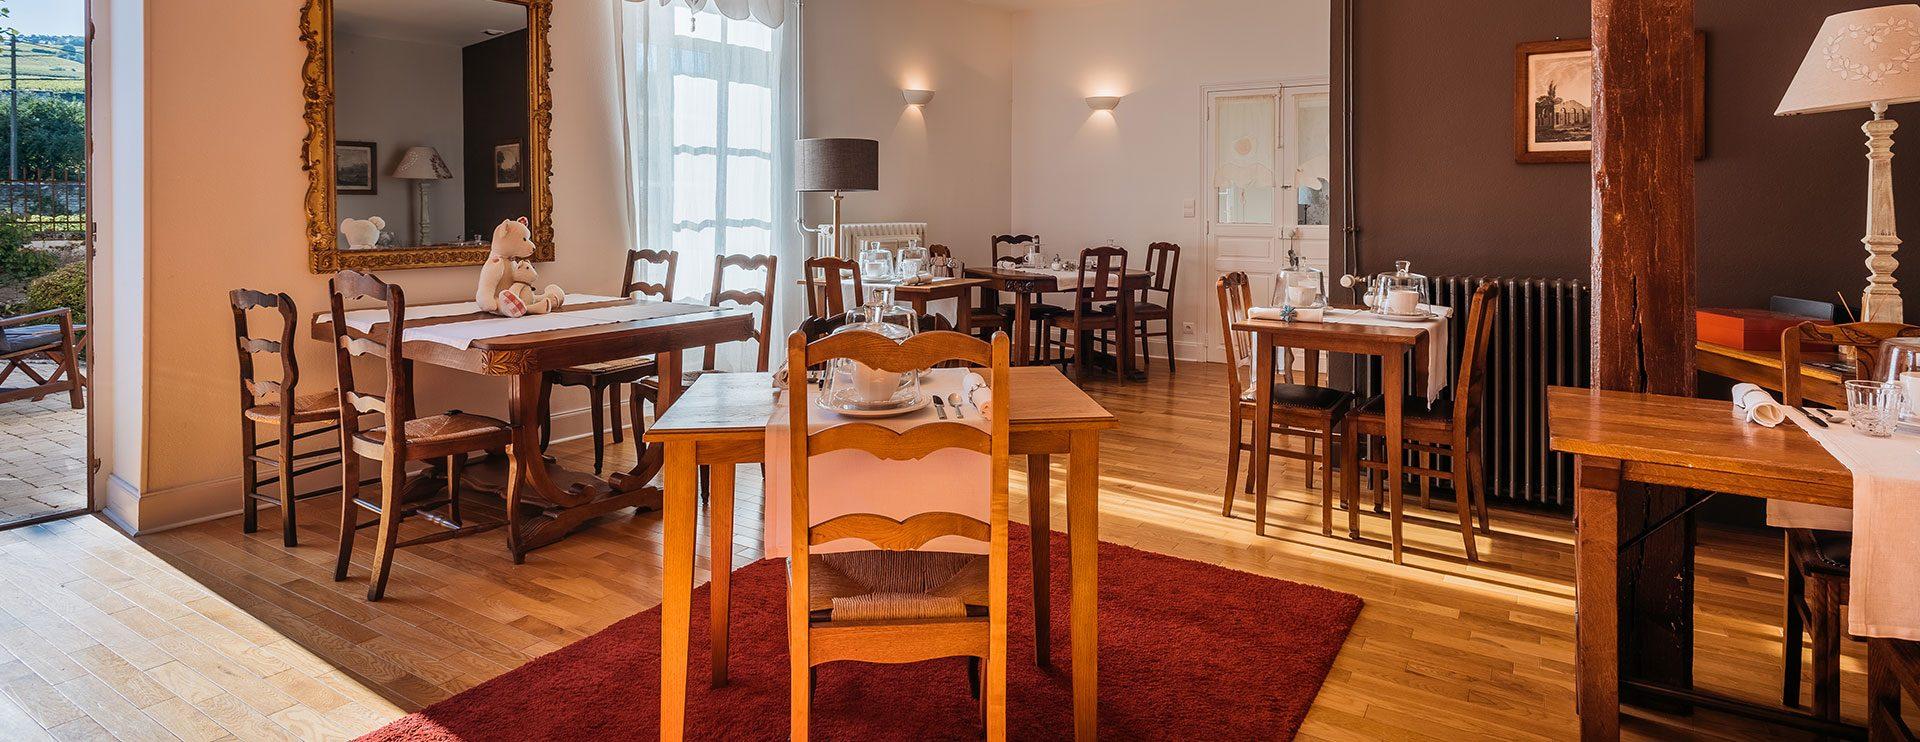 Restaurant Clos du Colombier 1817